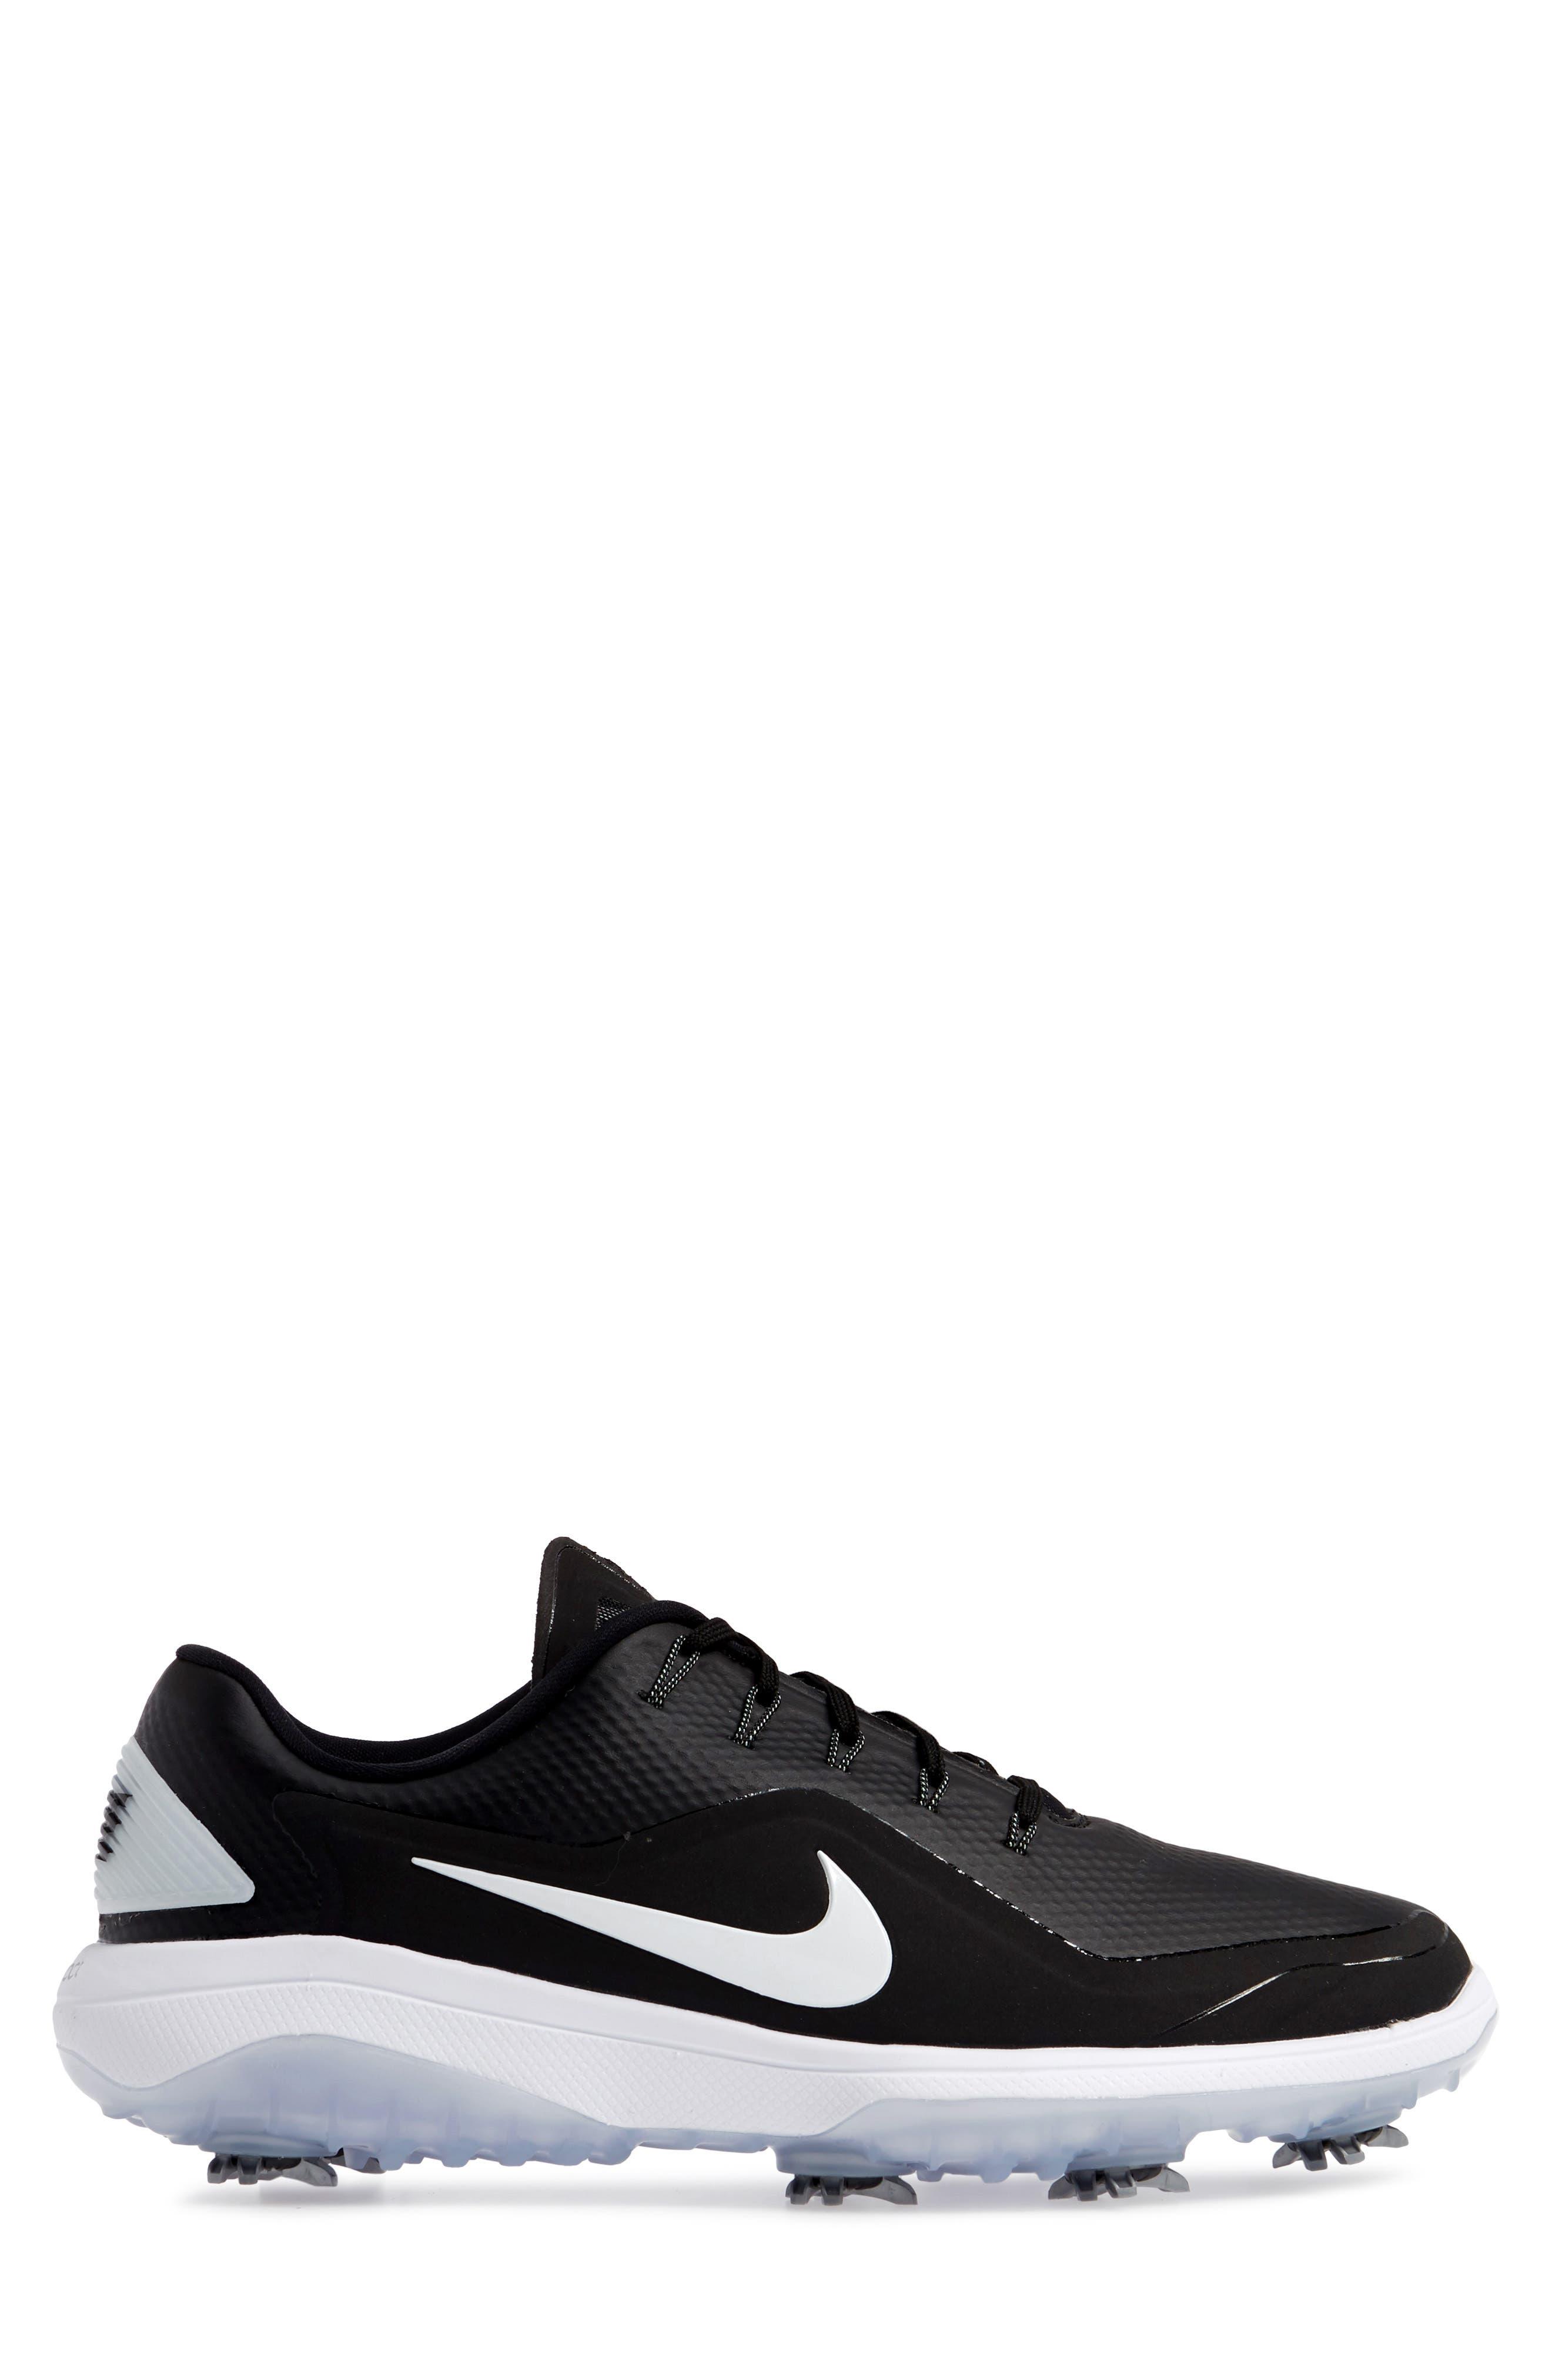 NIKE, React Vapor 2 Golf Shoe, Alternate thumbnail 3, color, BLACK/ METALLIC WHITE